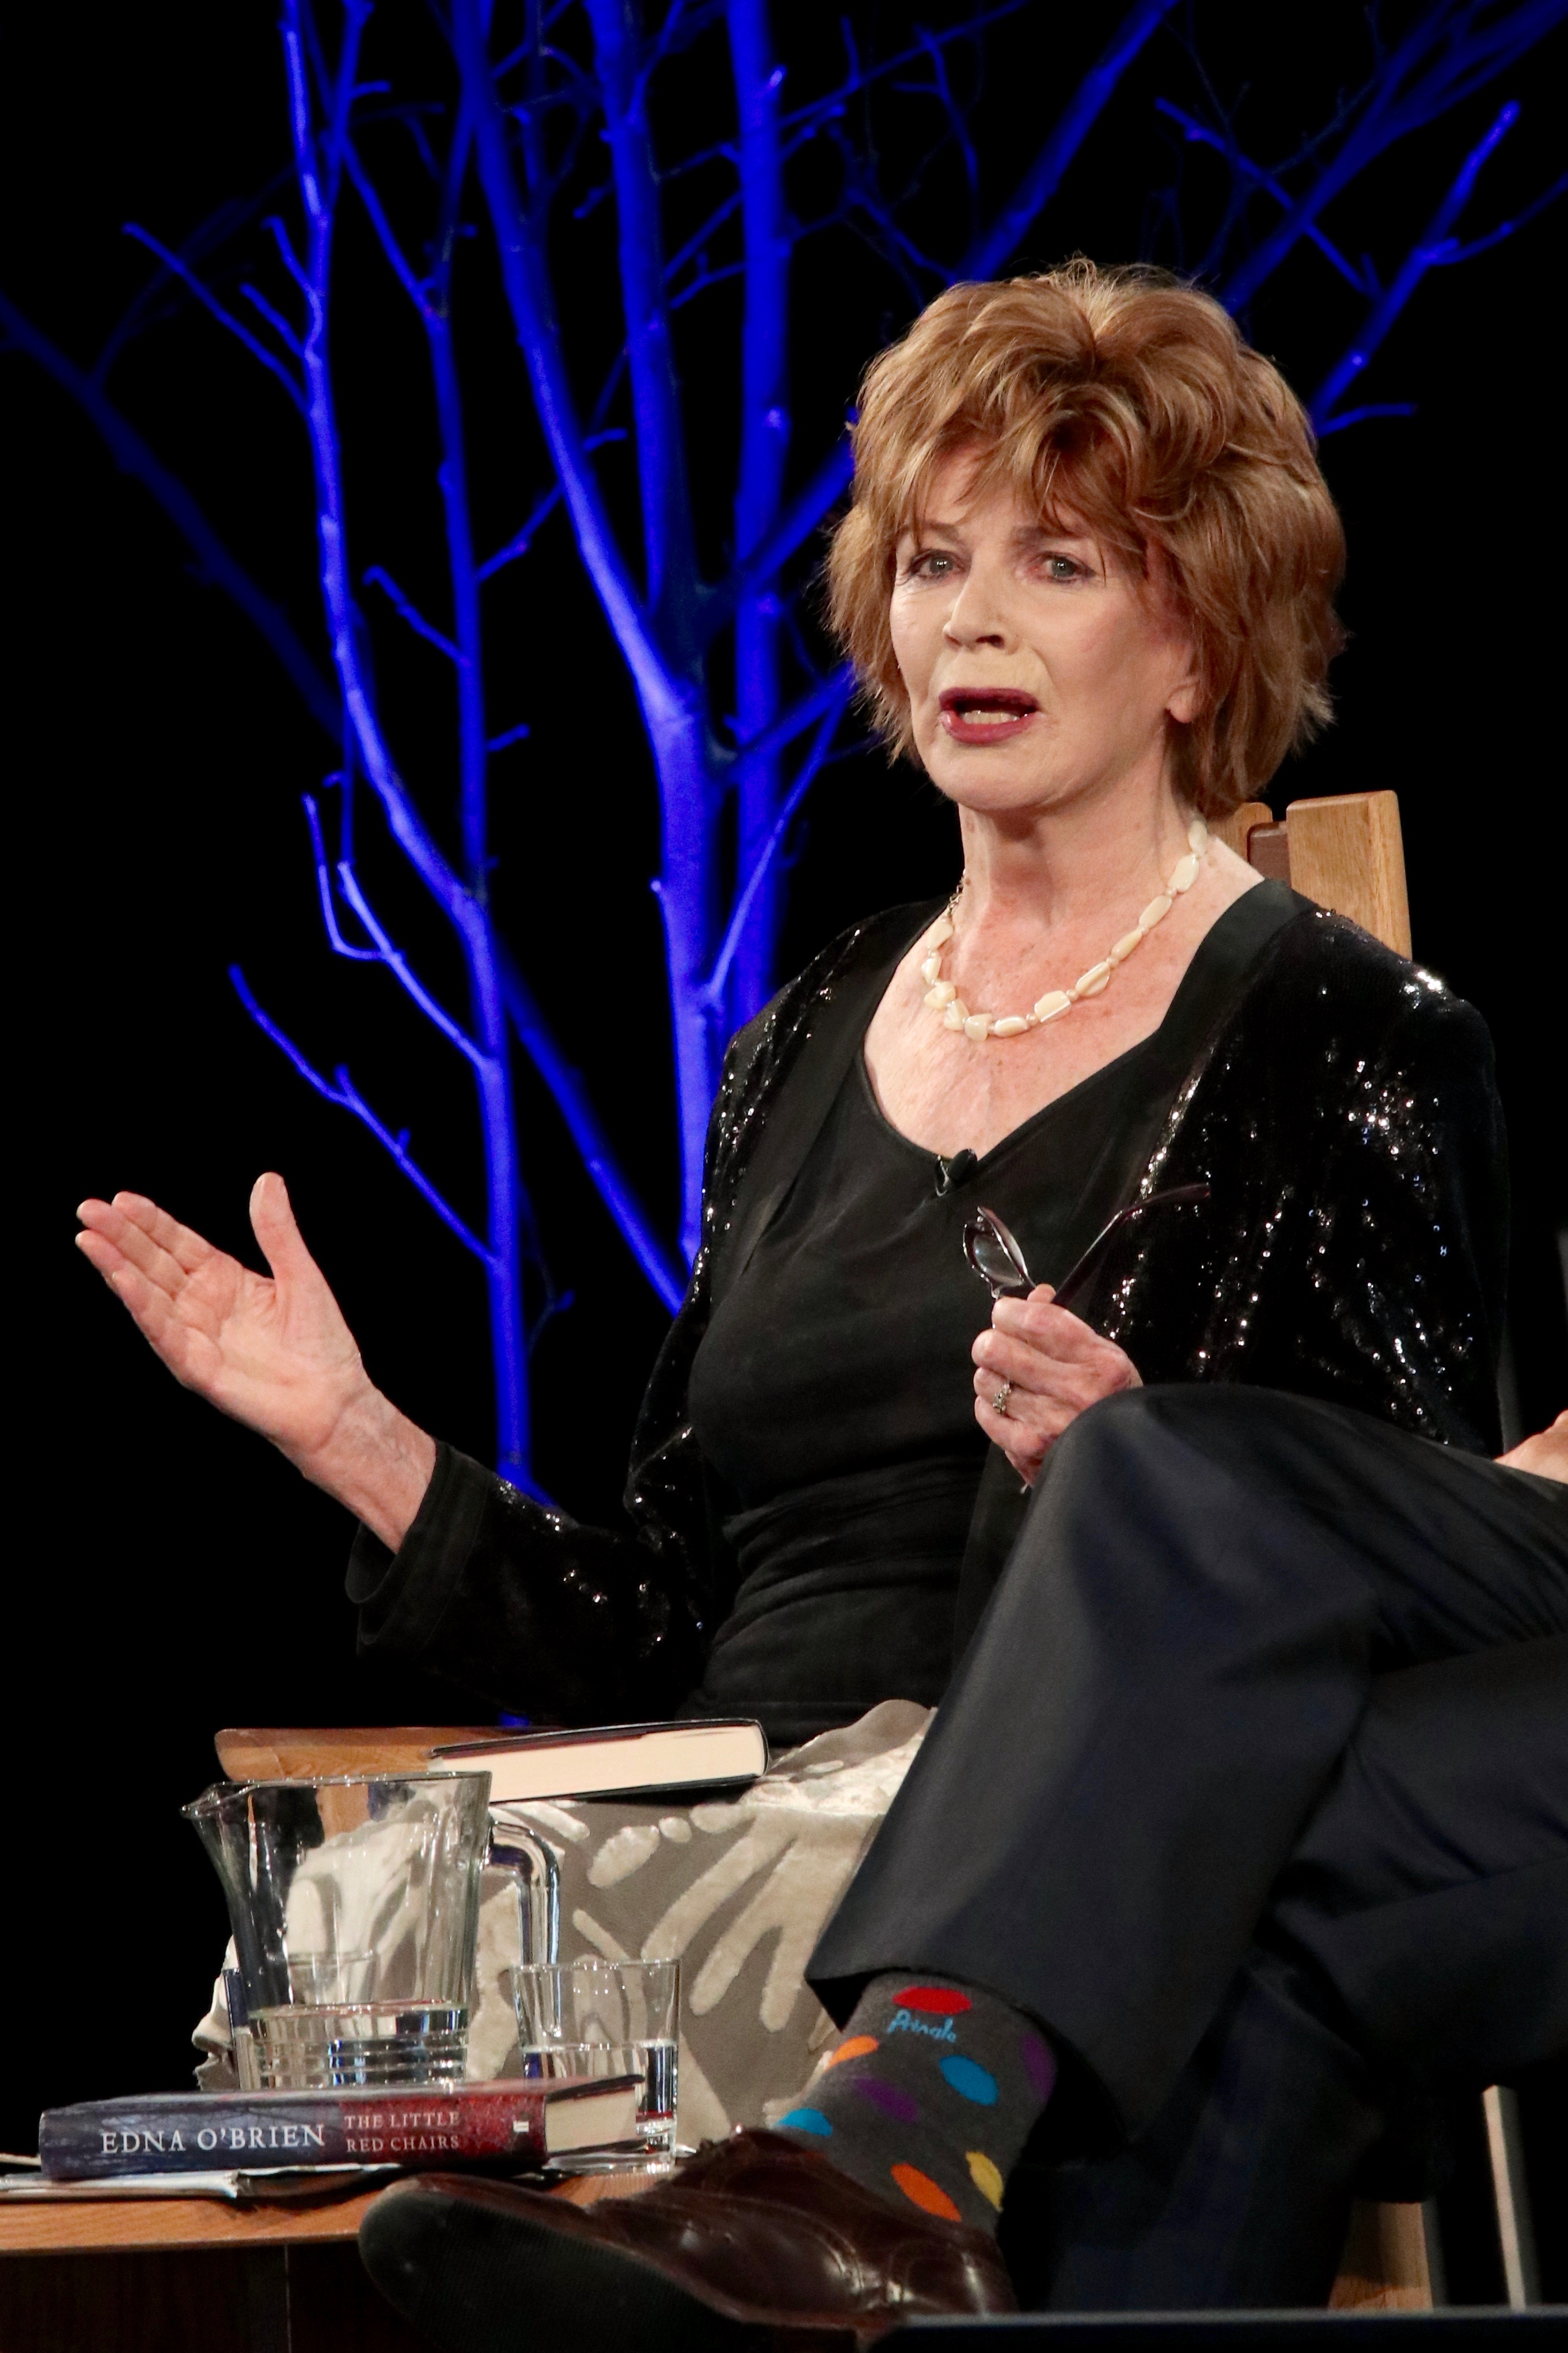 O'Brien at the 2016 [[Hay Festival]]